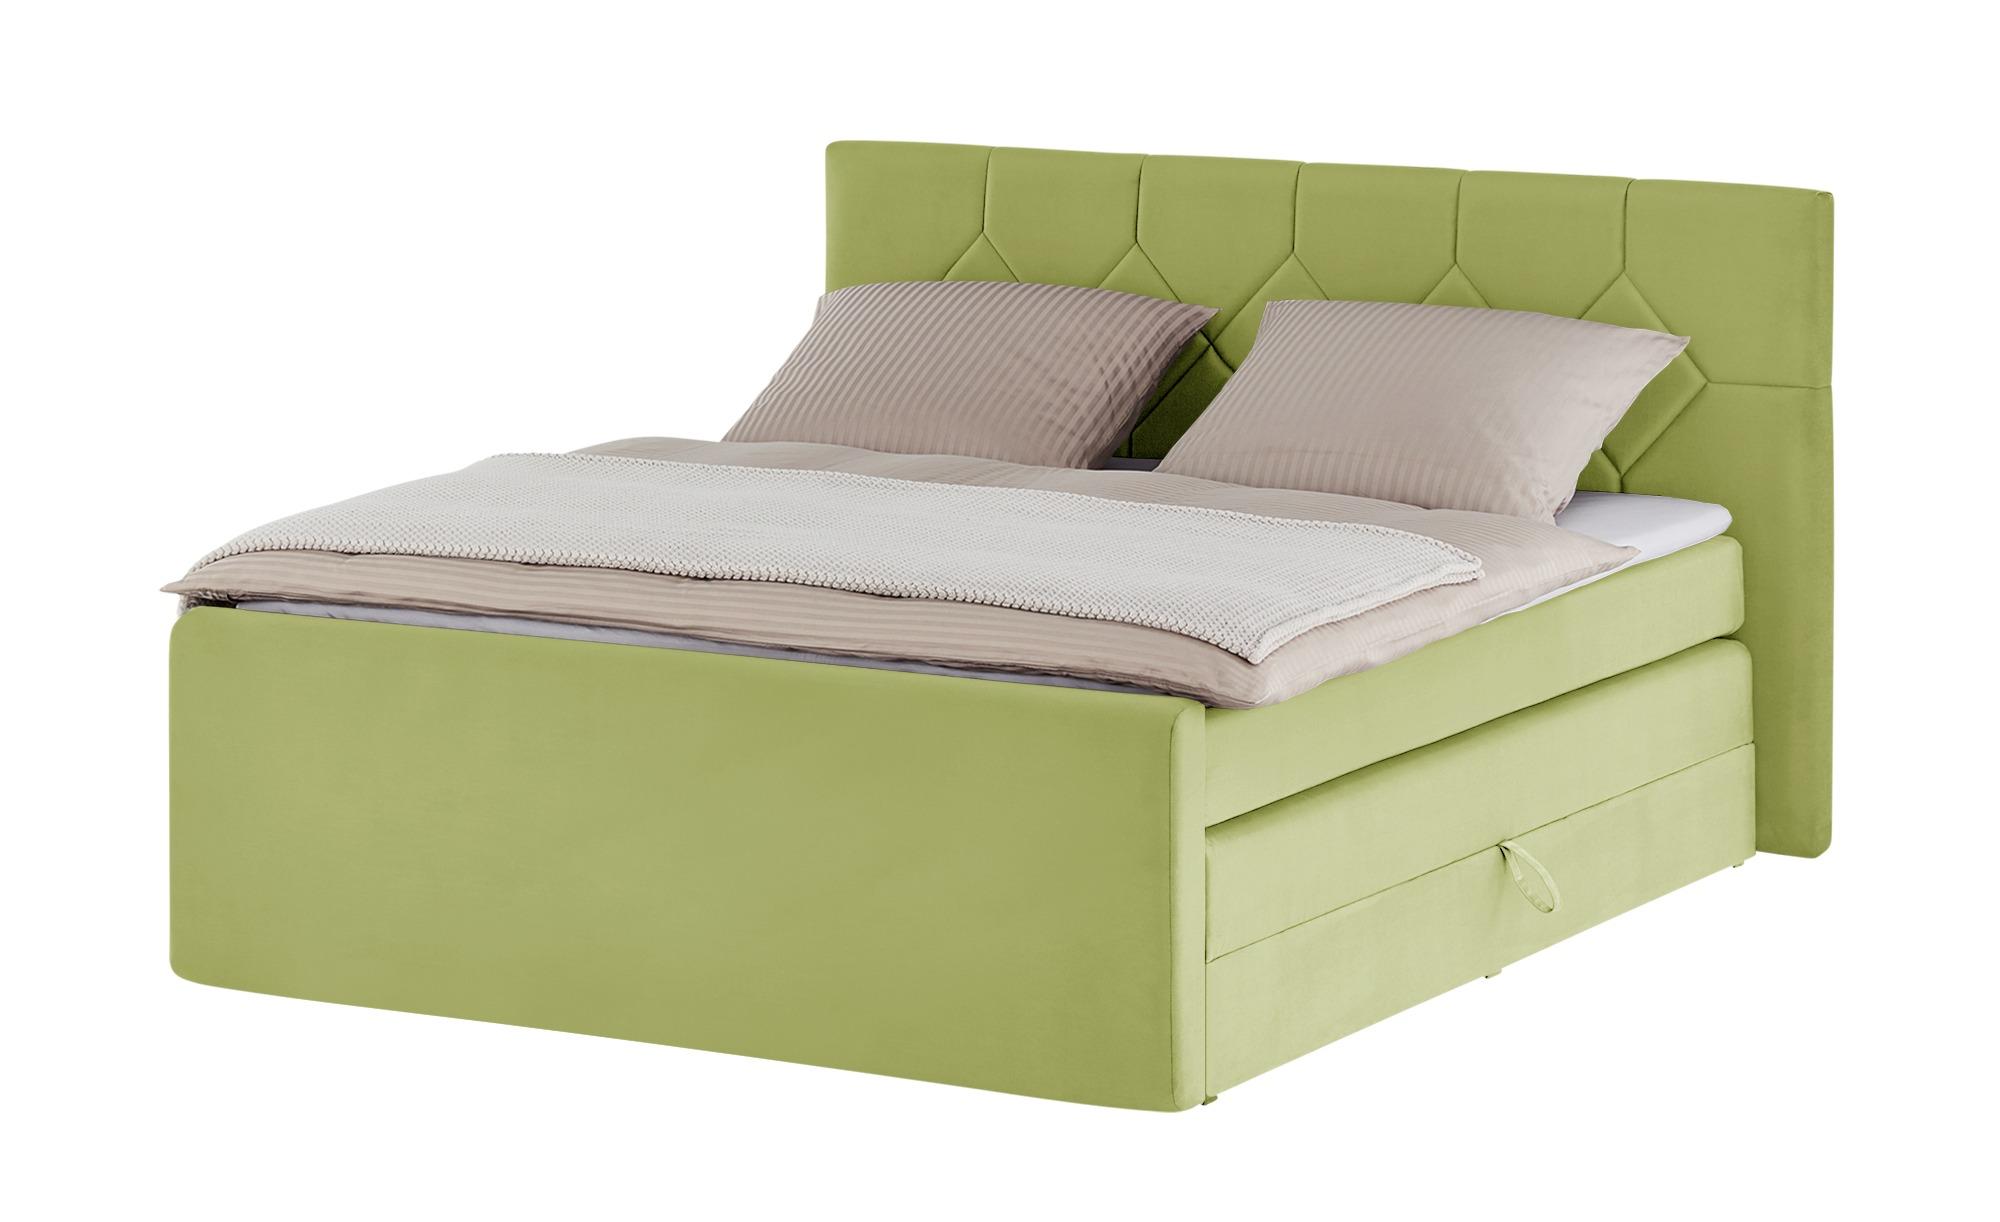 Boxspringbett  Empress ¦ grün ¦ Maße (cm): B: 200 H: 115 T: 221 Betten > Boxspringbetten > Boxspringbetten 180x200 - Höffner